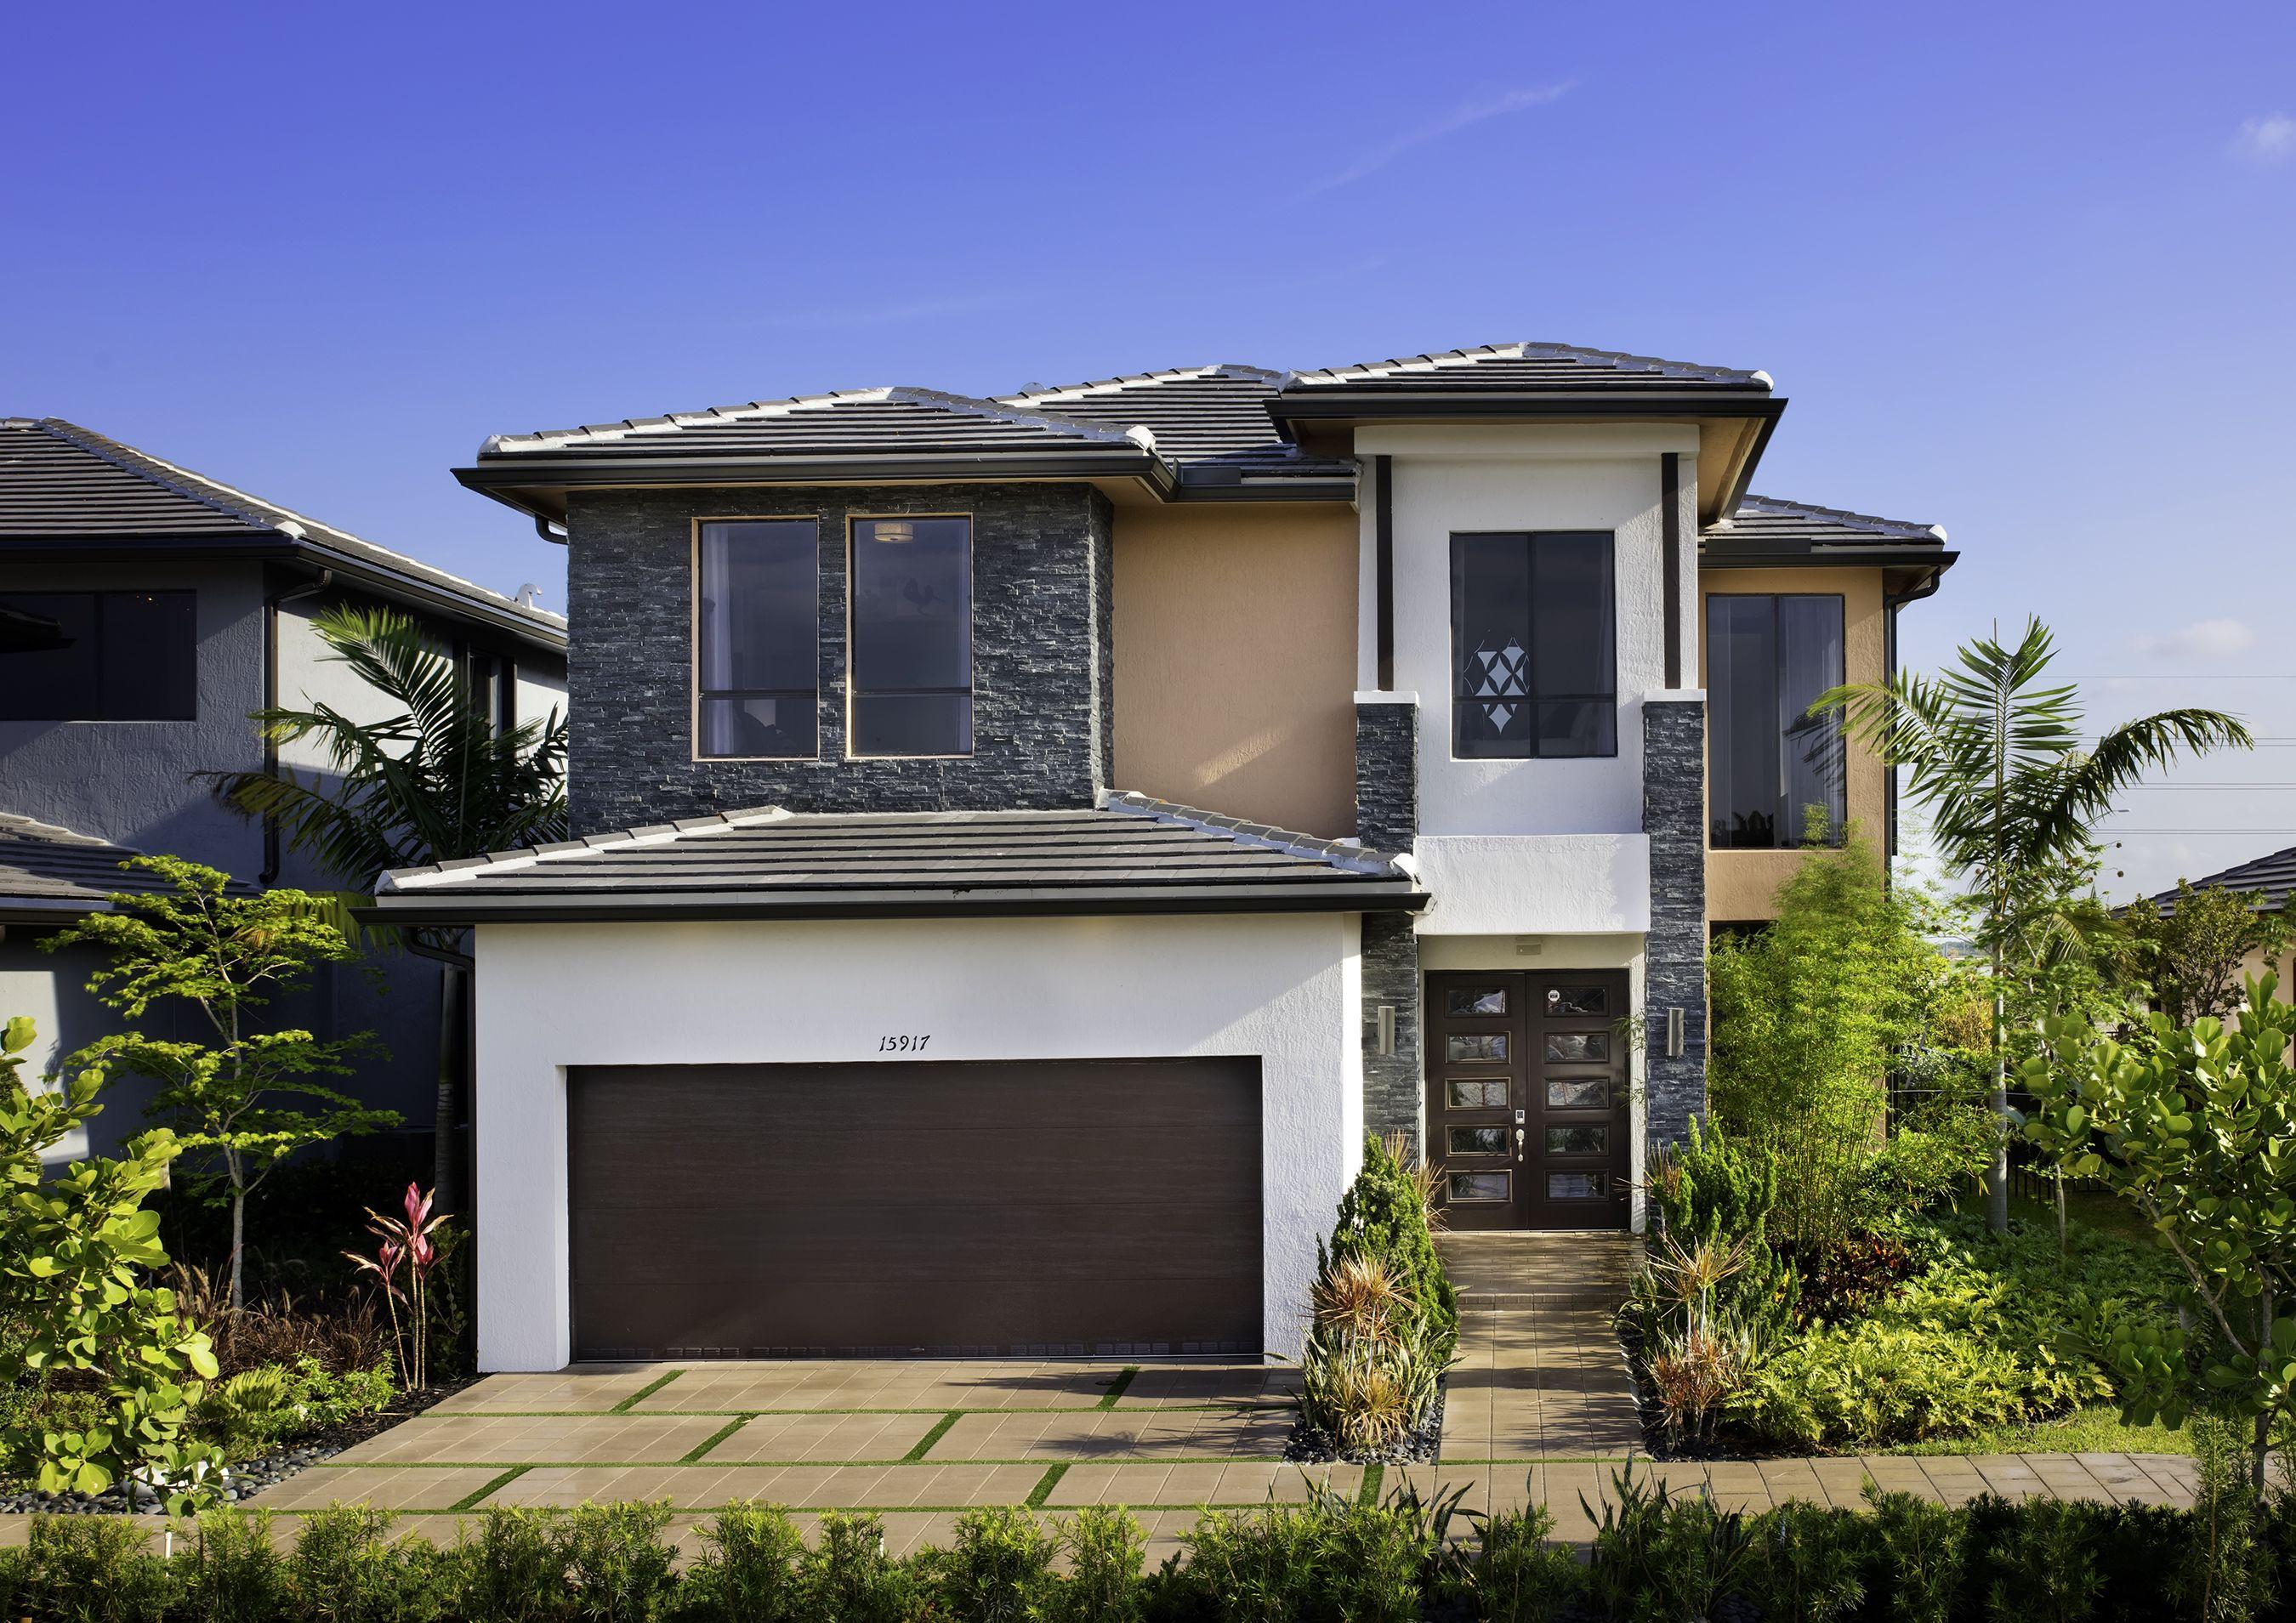 Lennar Florida Deals In Southeast Florida Lennar New Home Communities Residential Real Estate